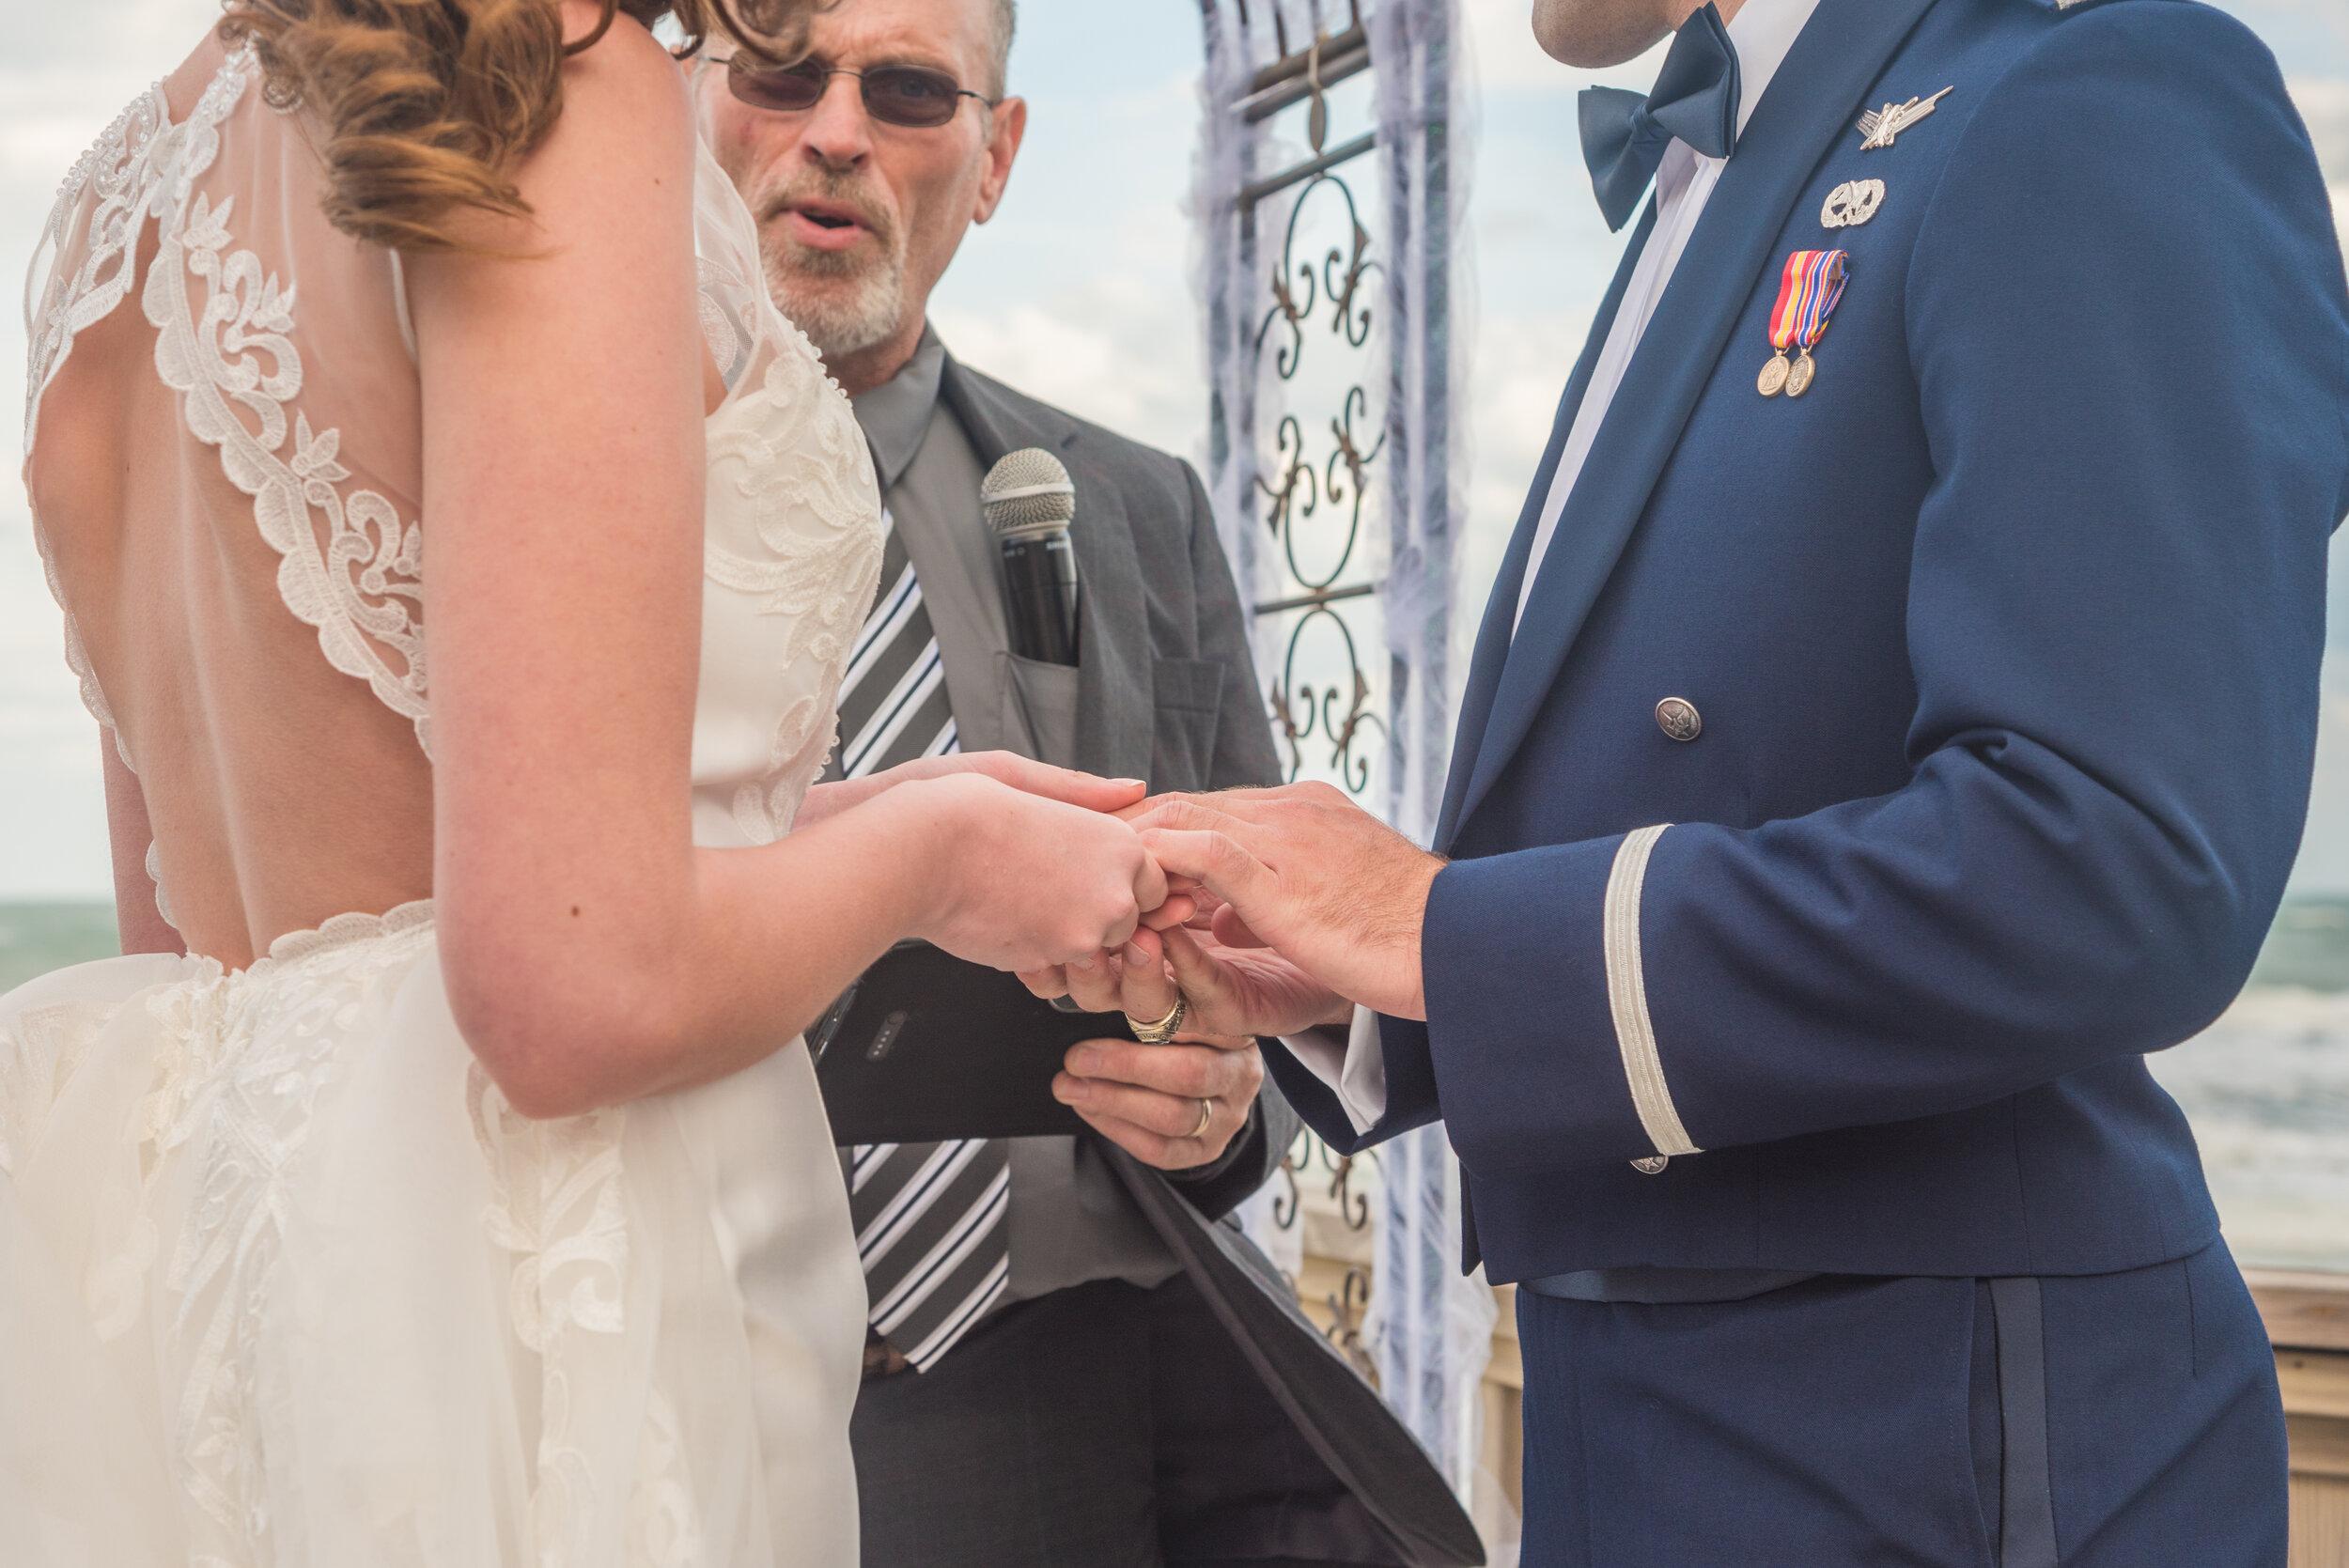 andru-the-tide-club-air-force-wedding-patrickafb-1-37.jpg